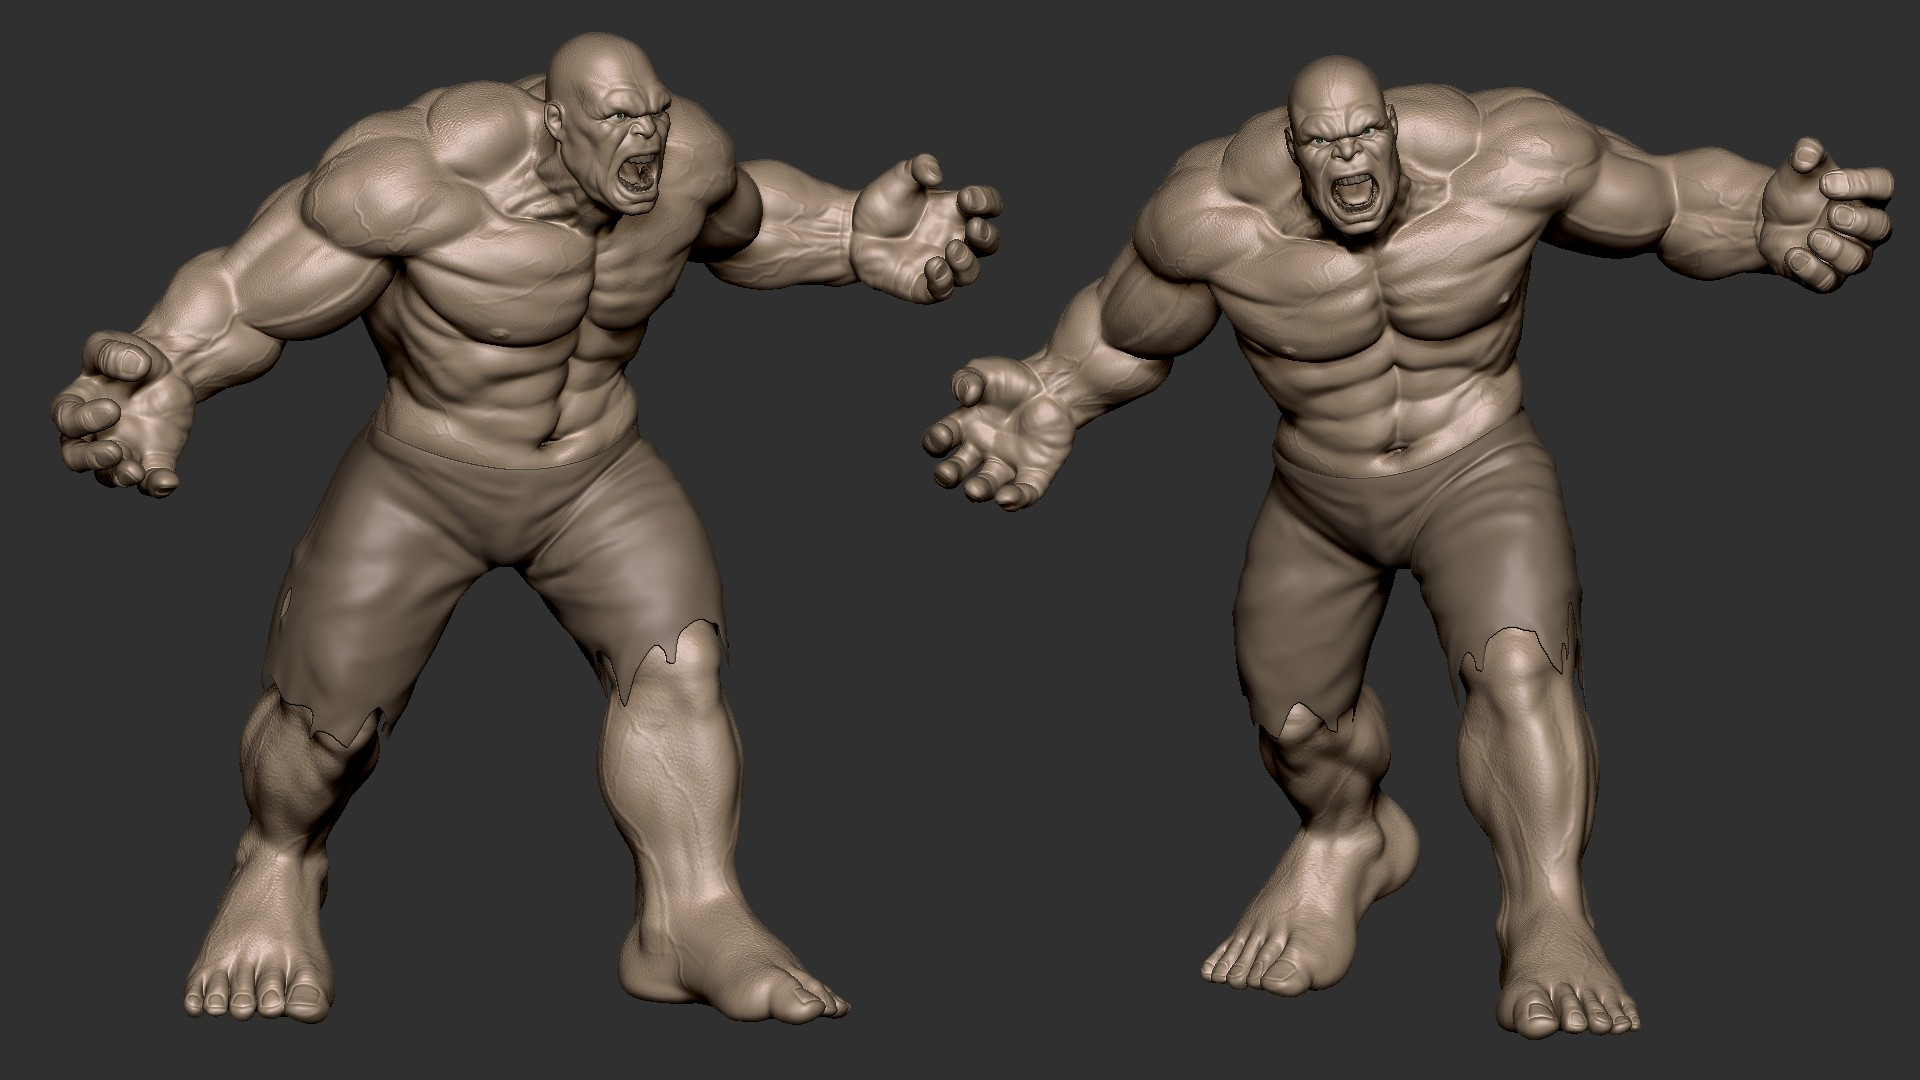 Euen Tan The Incredible Hulk